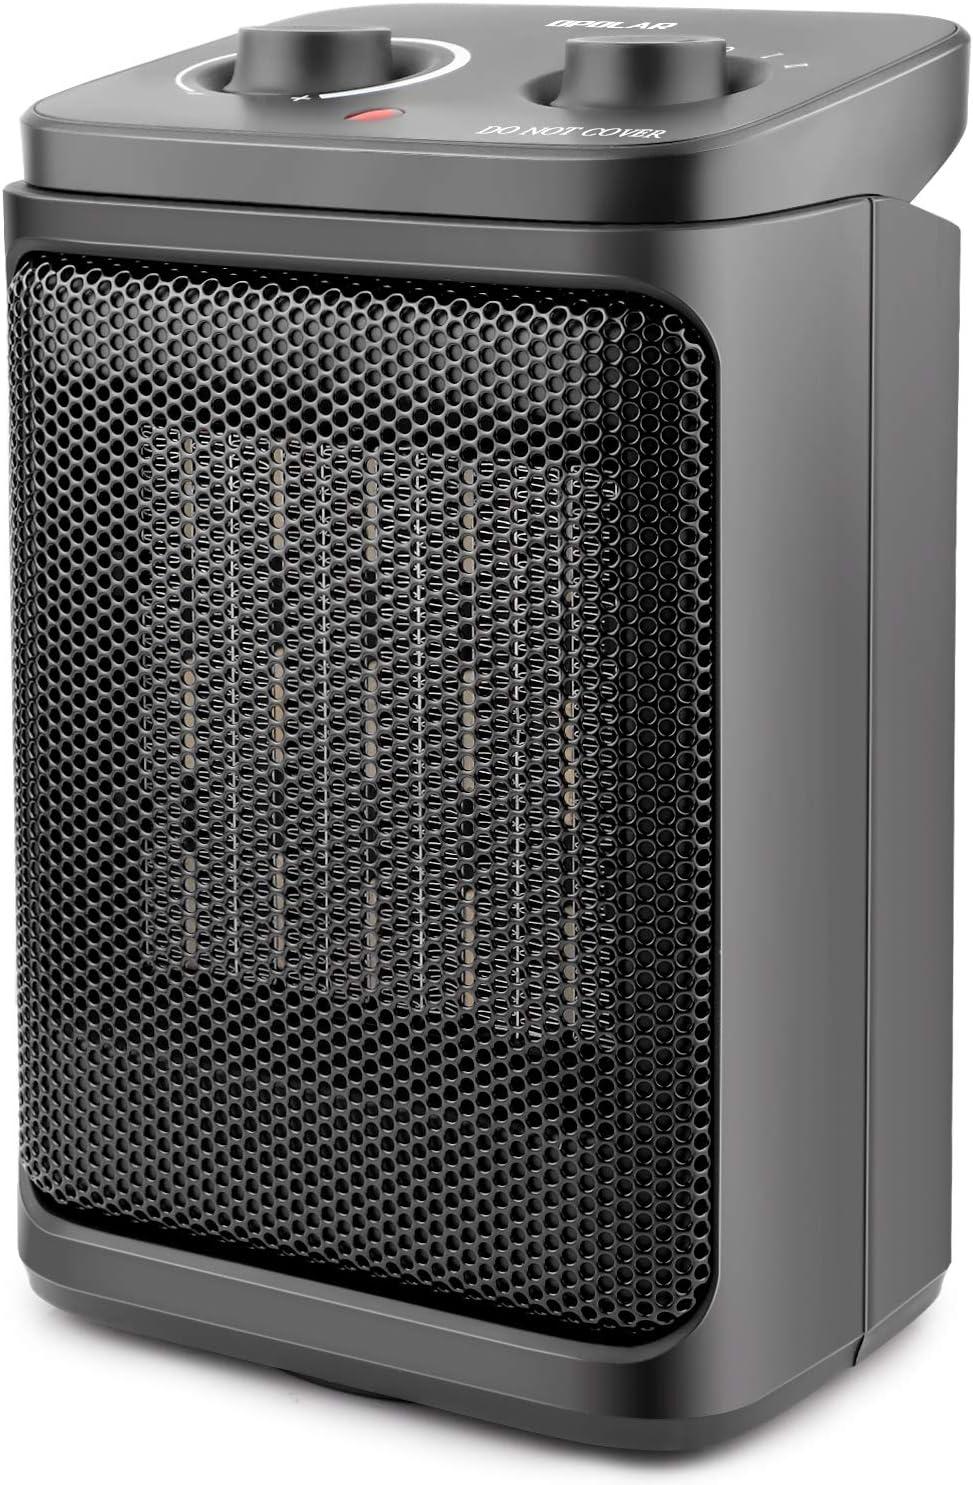 Opolar 1500W Ceramic Space Heater}